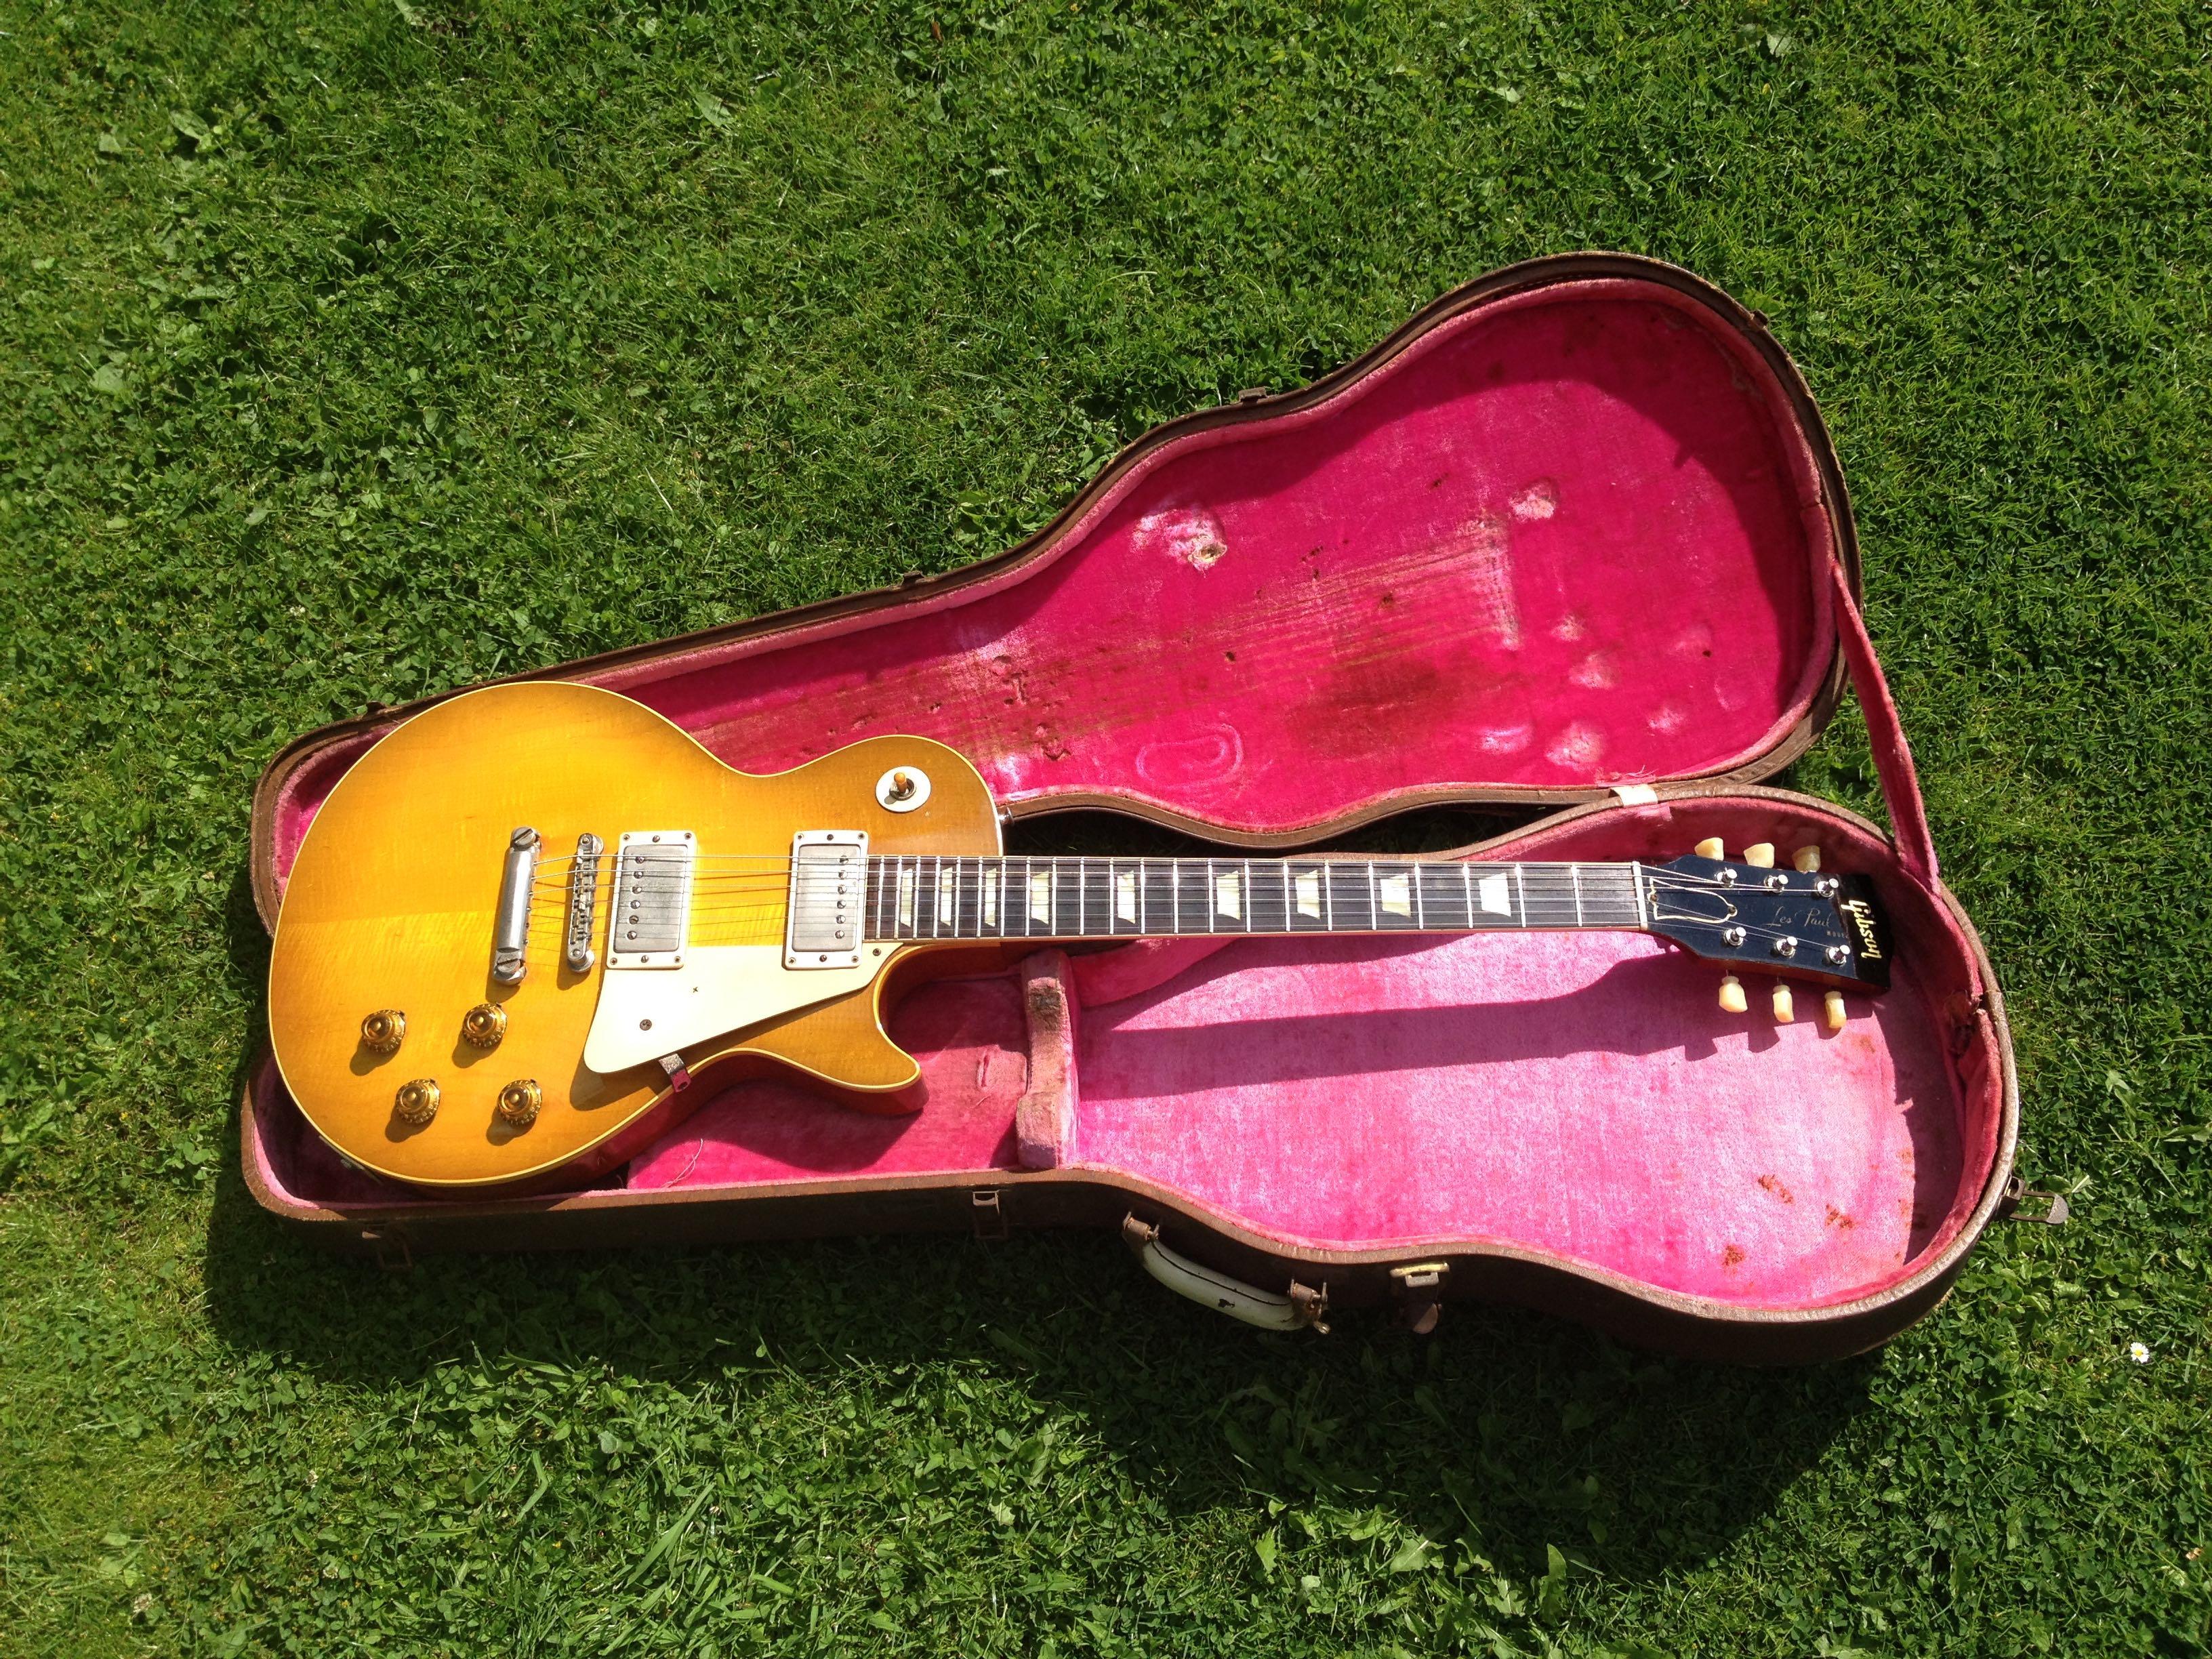 gibson les paul standard 1959 lemon drop guitar for sale denmark street guitars. Black Bedroom Furniture Sets. Home Design Ideas